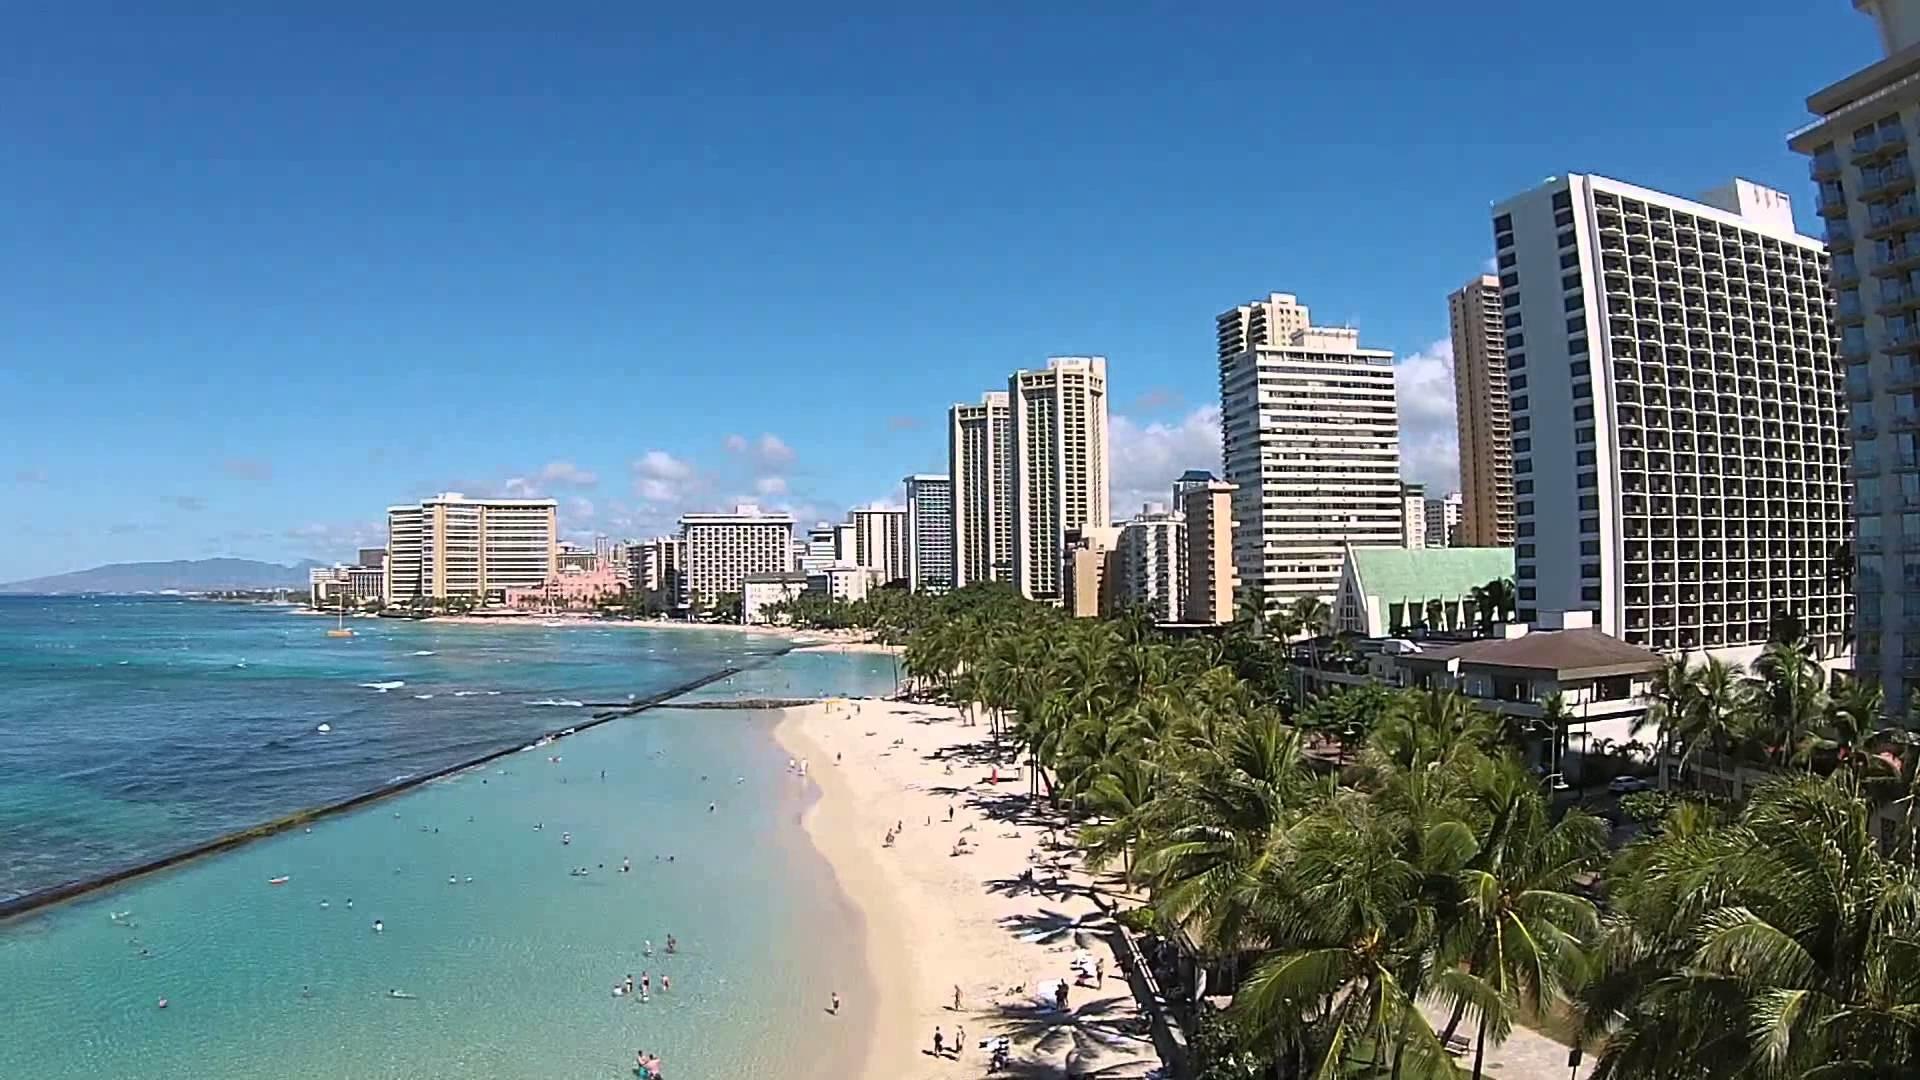 Res: 1920x1080, Waikiki Beach in Hawaii near the Honolulu Zoo DJI Phantom Drone